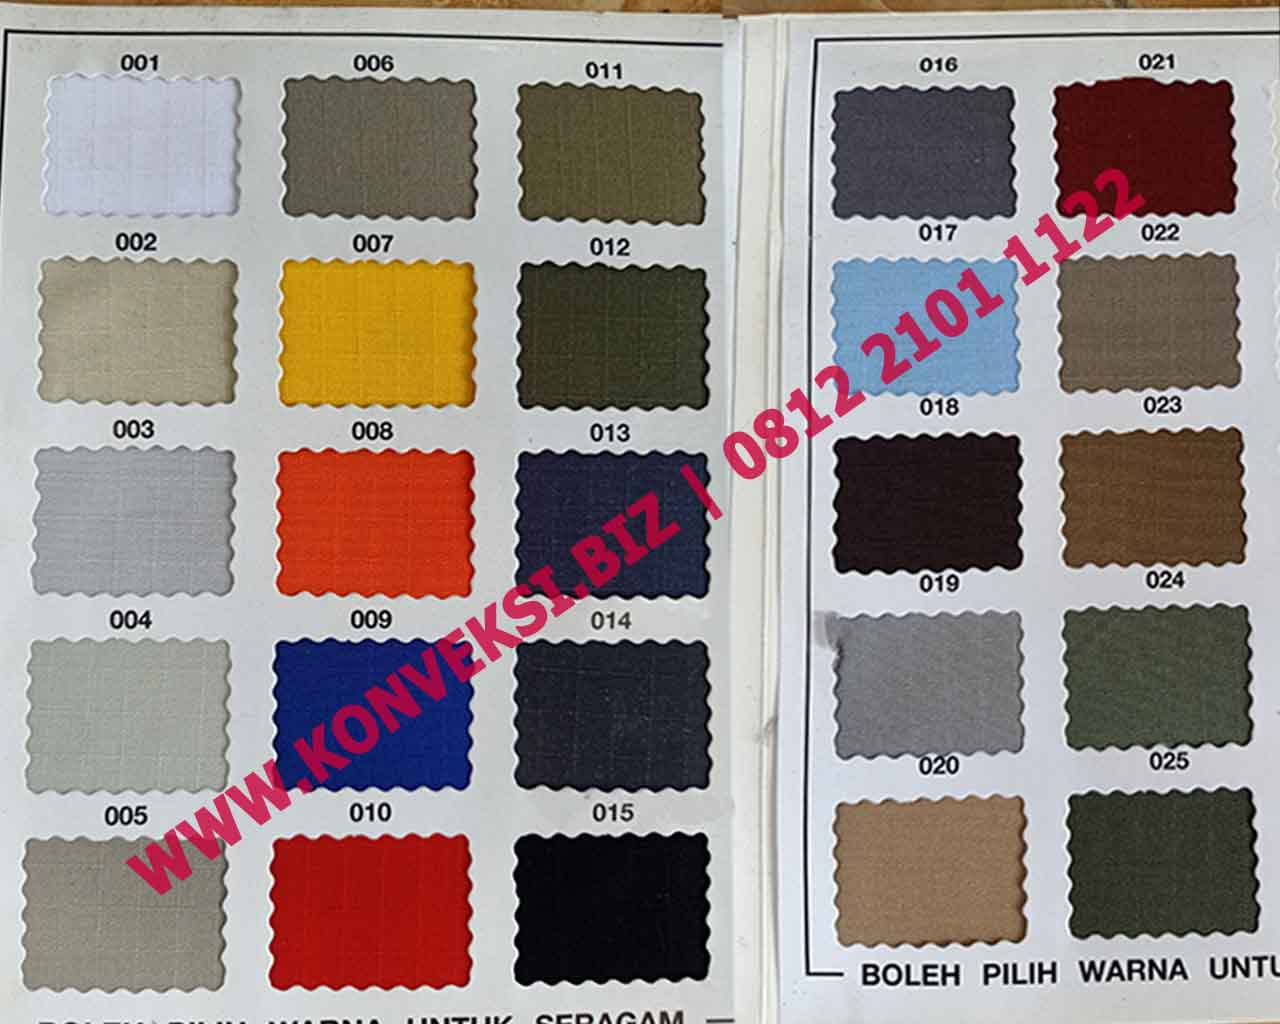 Katalog Warna Kain Ripstop